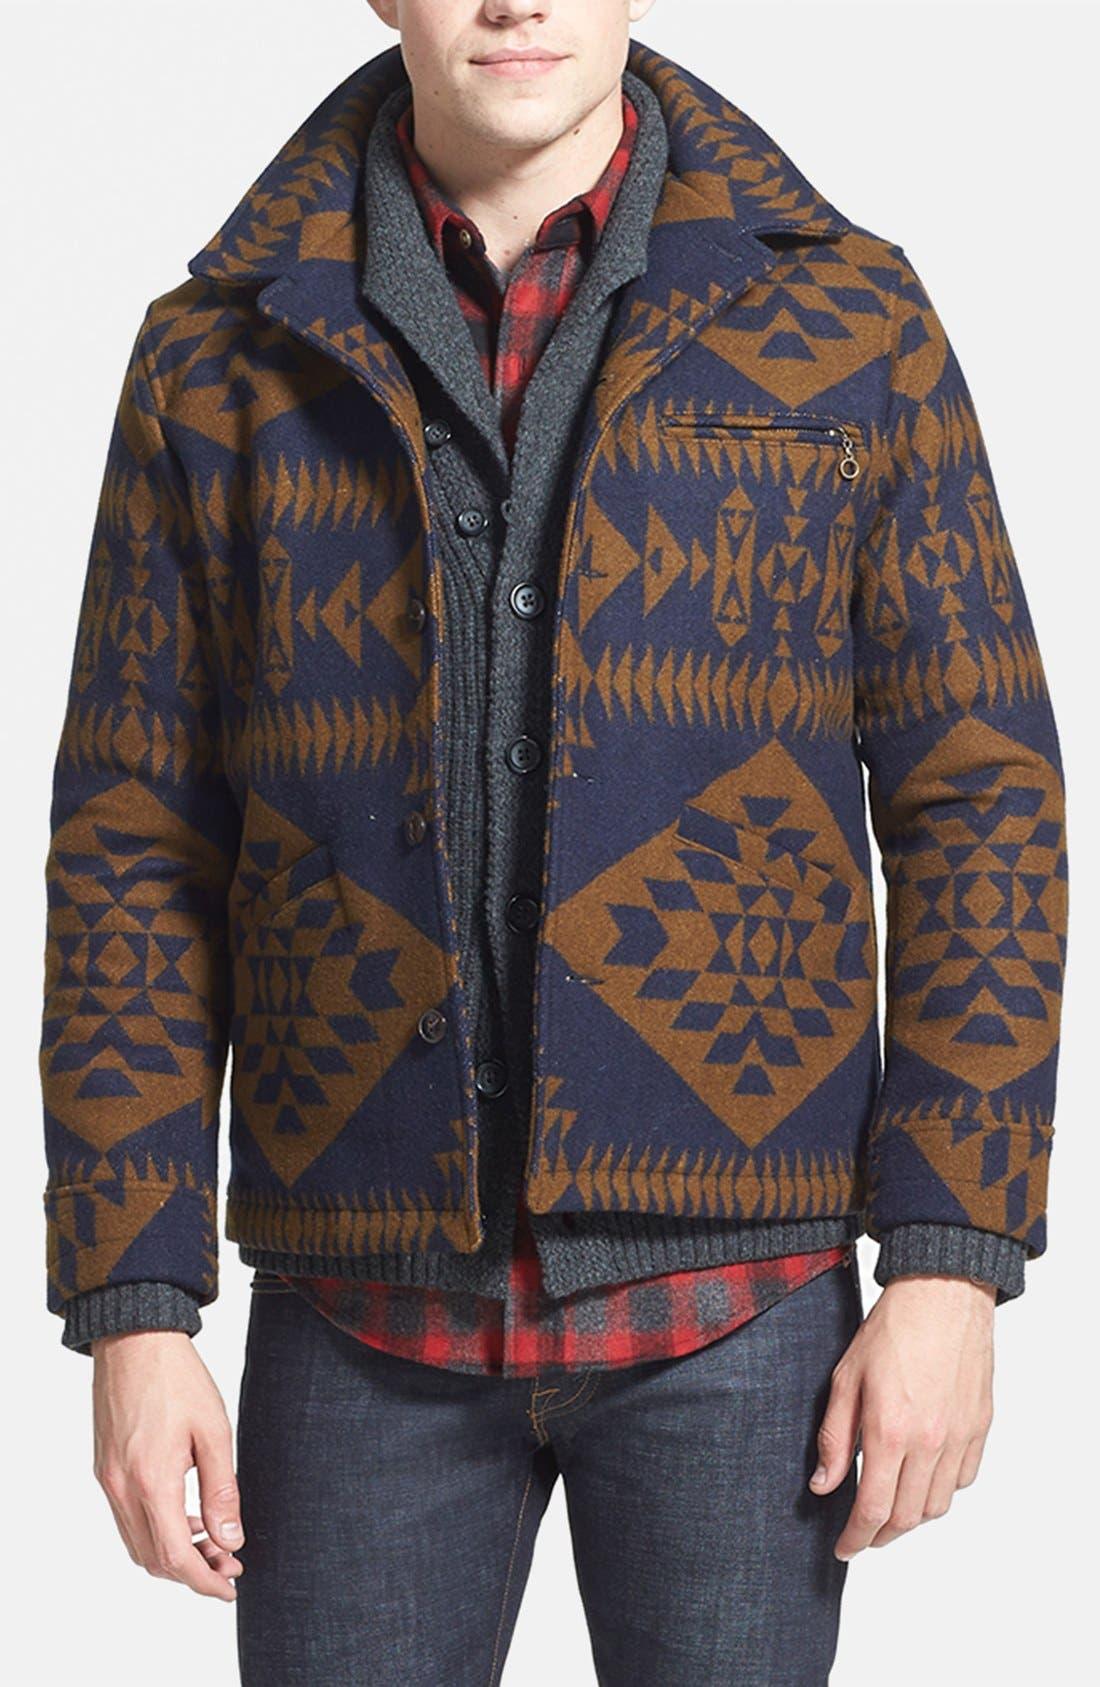 Alternate Image 1 Selected - Pendleton Jacket, 7 Diamonds Sweater, Pendleton Fitted Flannel Shirt & J Brand Skinny Fit Jeans